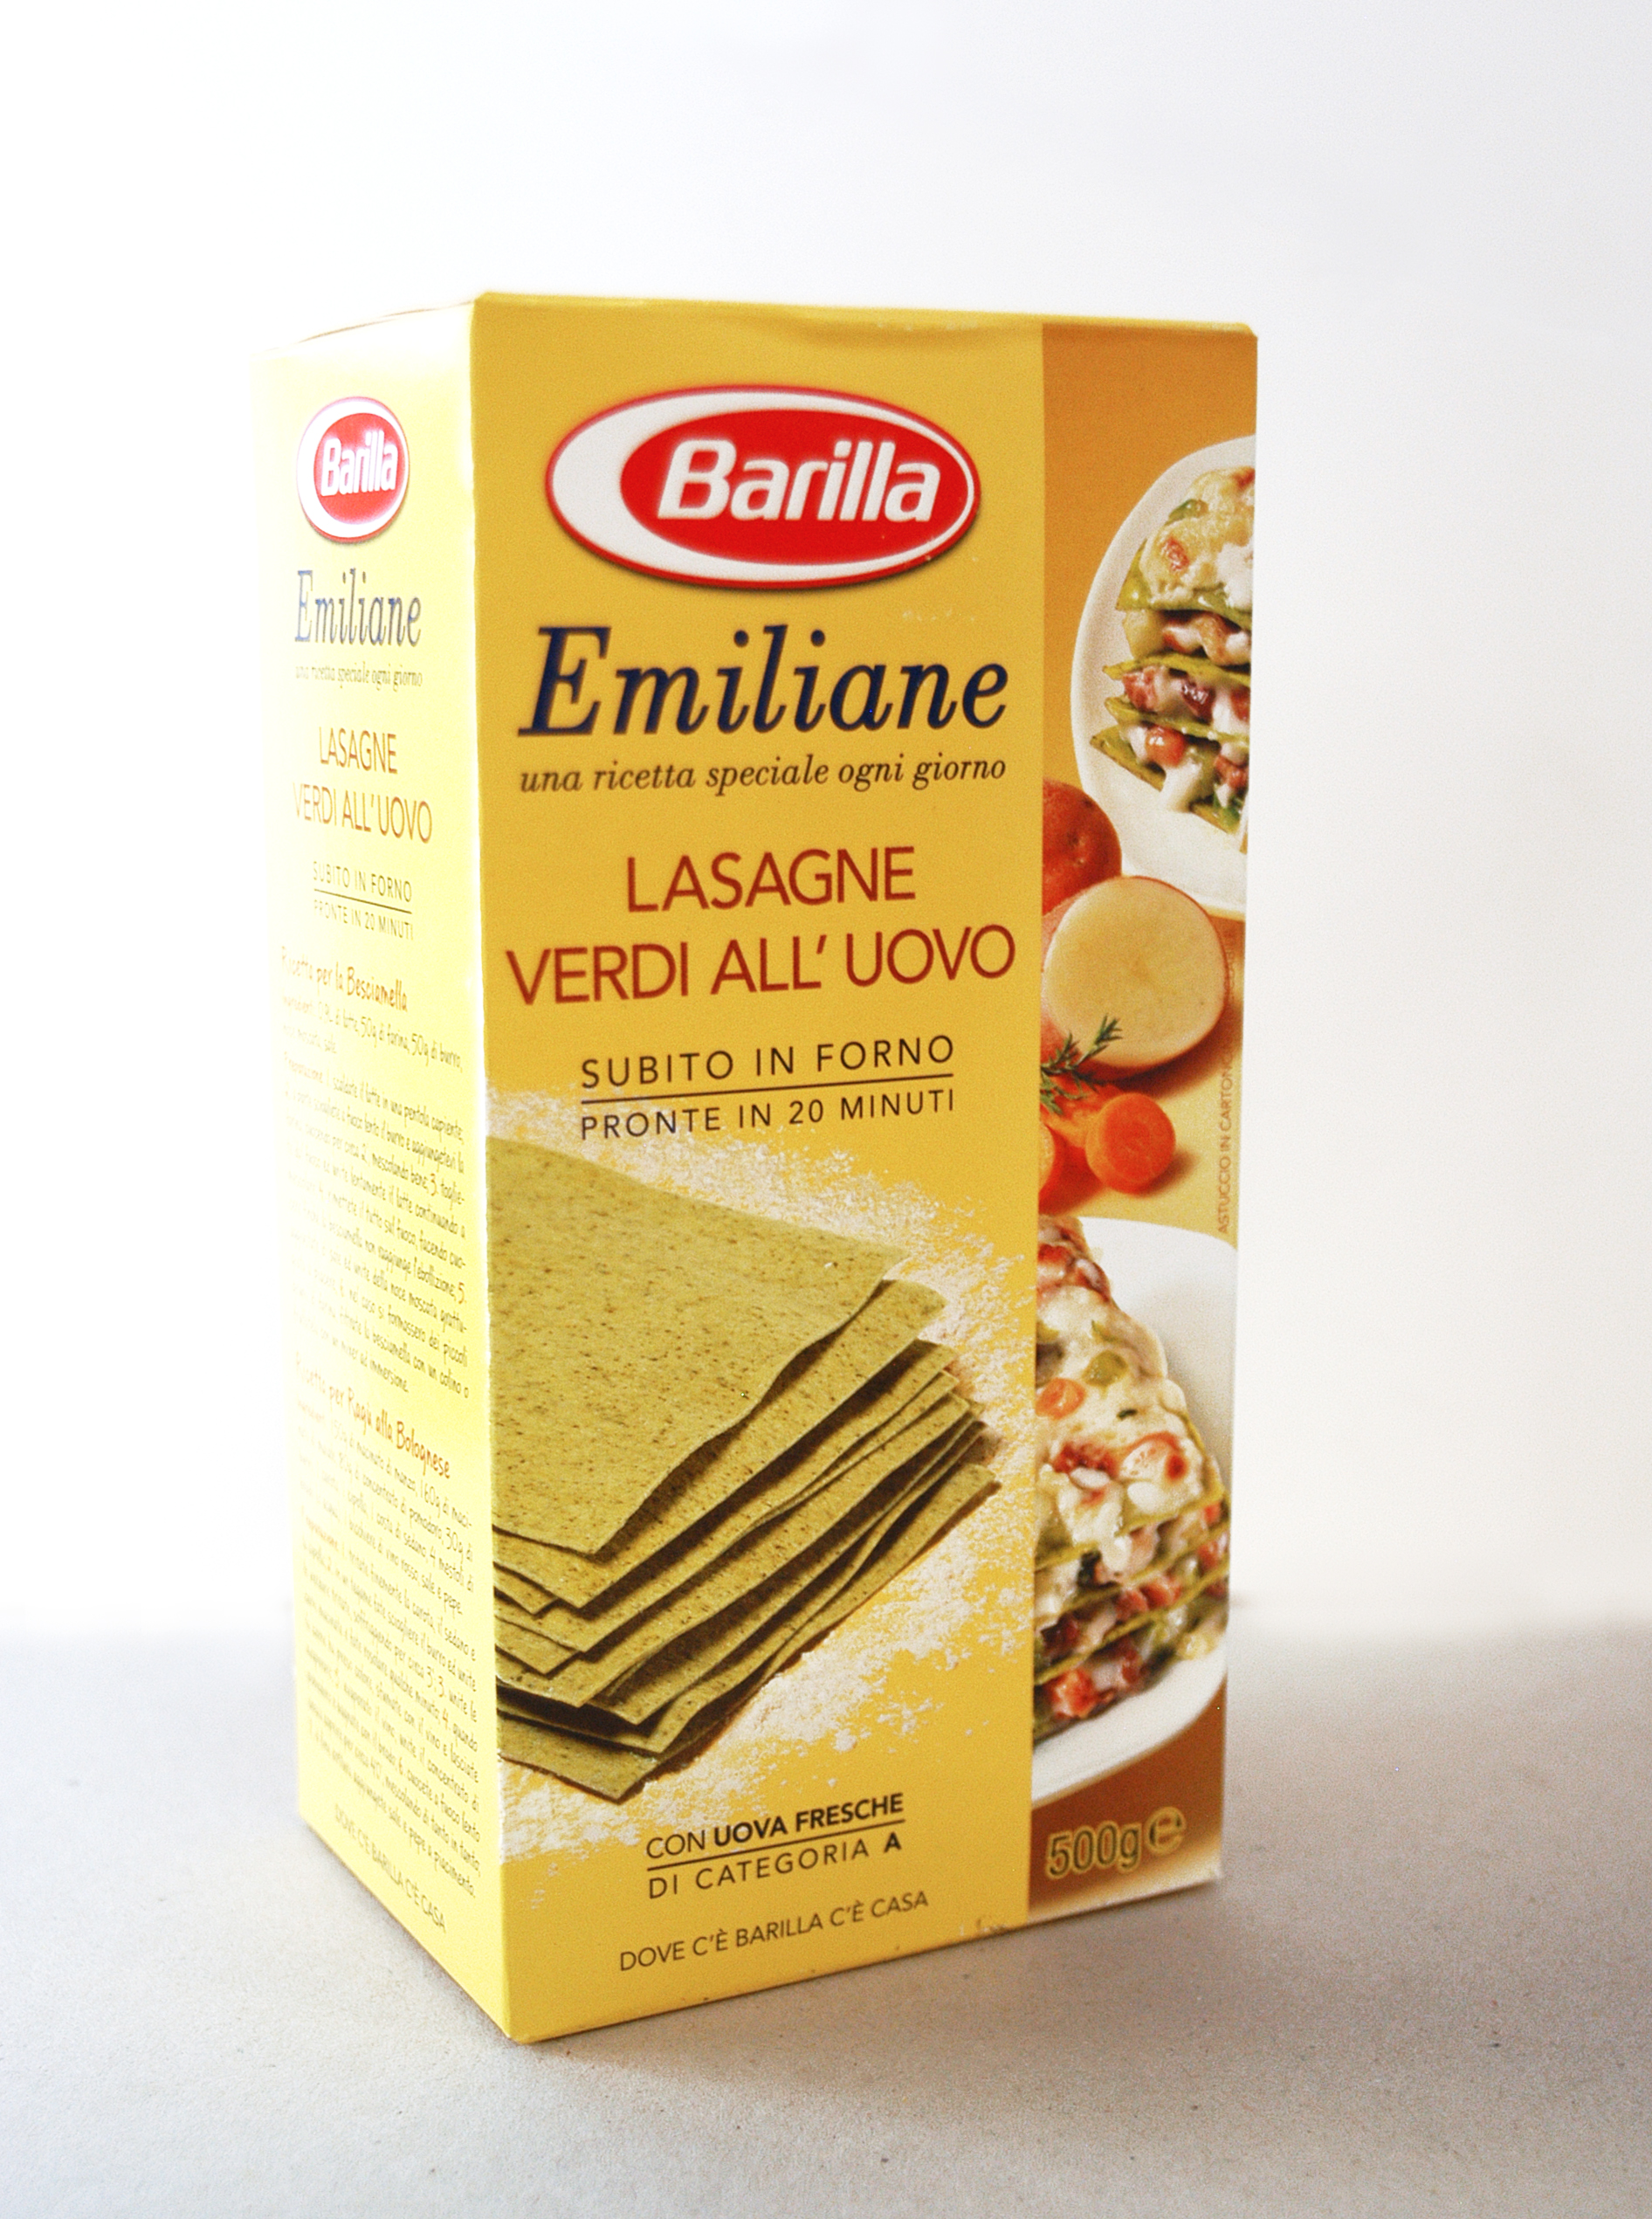 024017_lasagne_verdi_barilla_gr500